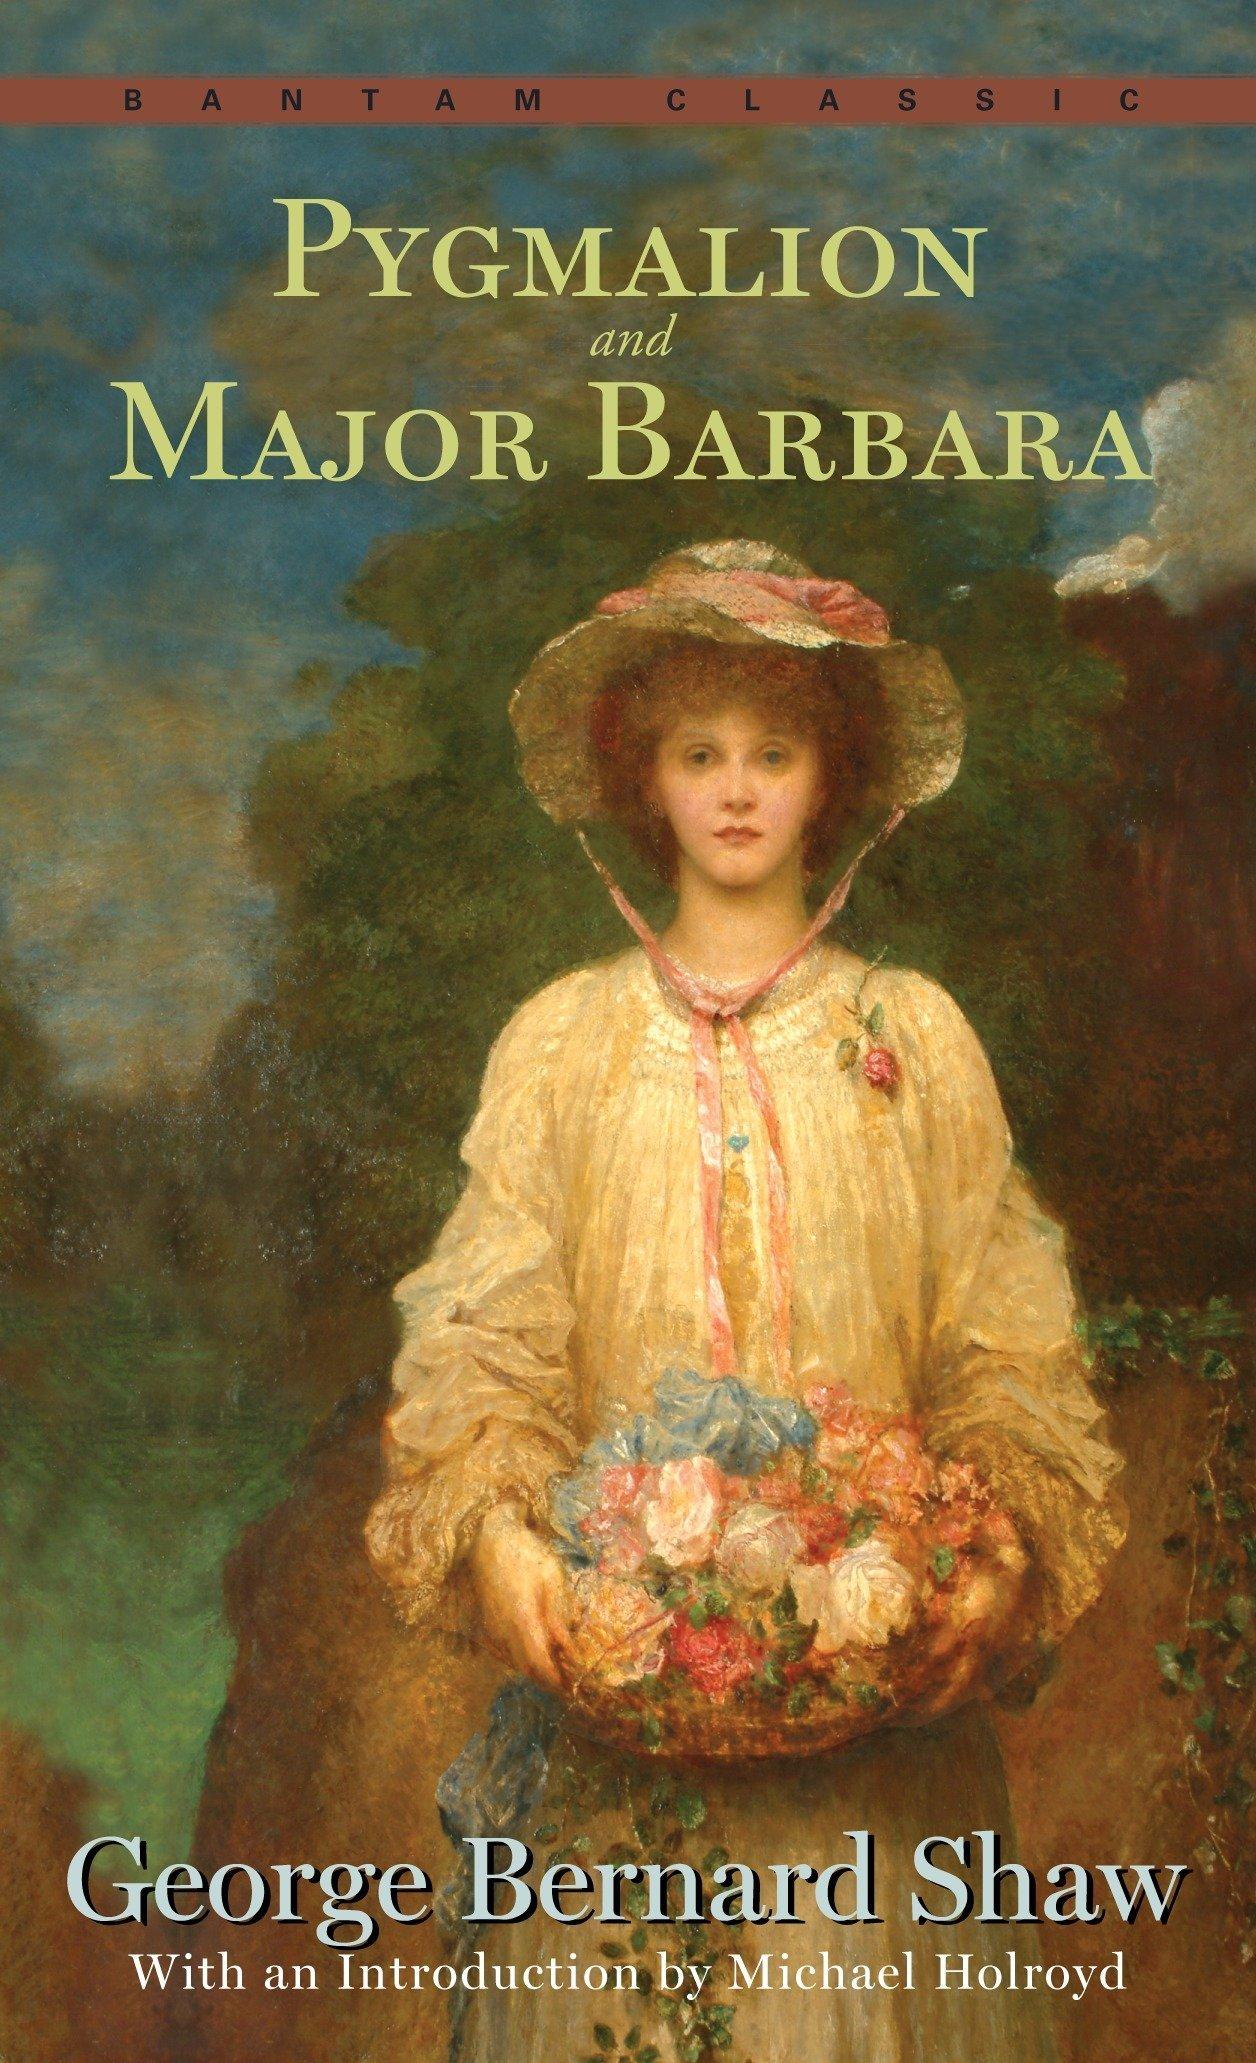 pygmalion and major barbara bantam classics